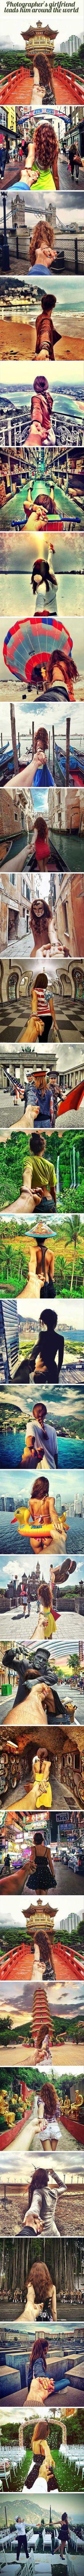 Photographer's Girlfriend Led Him Around The World